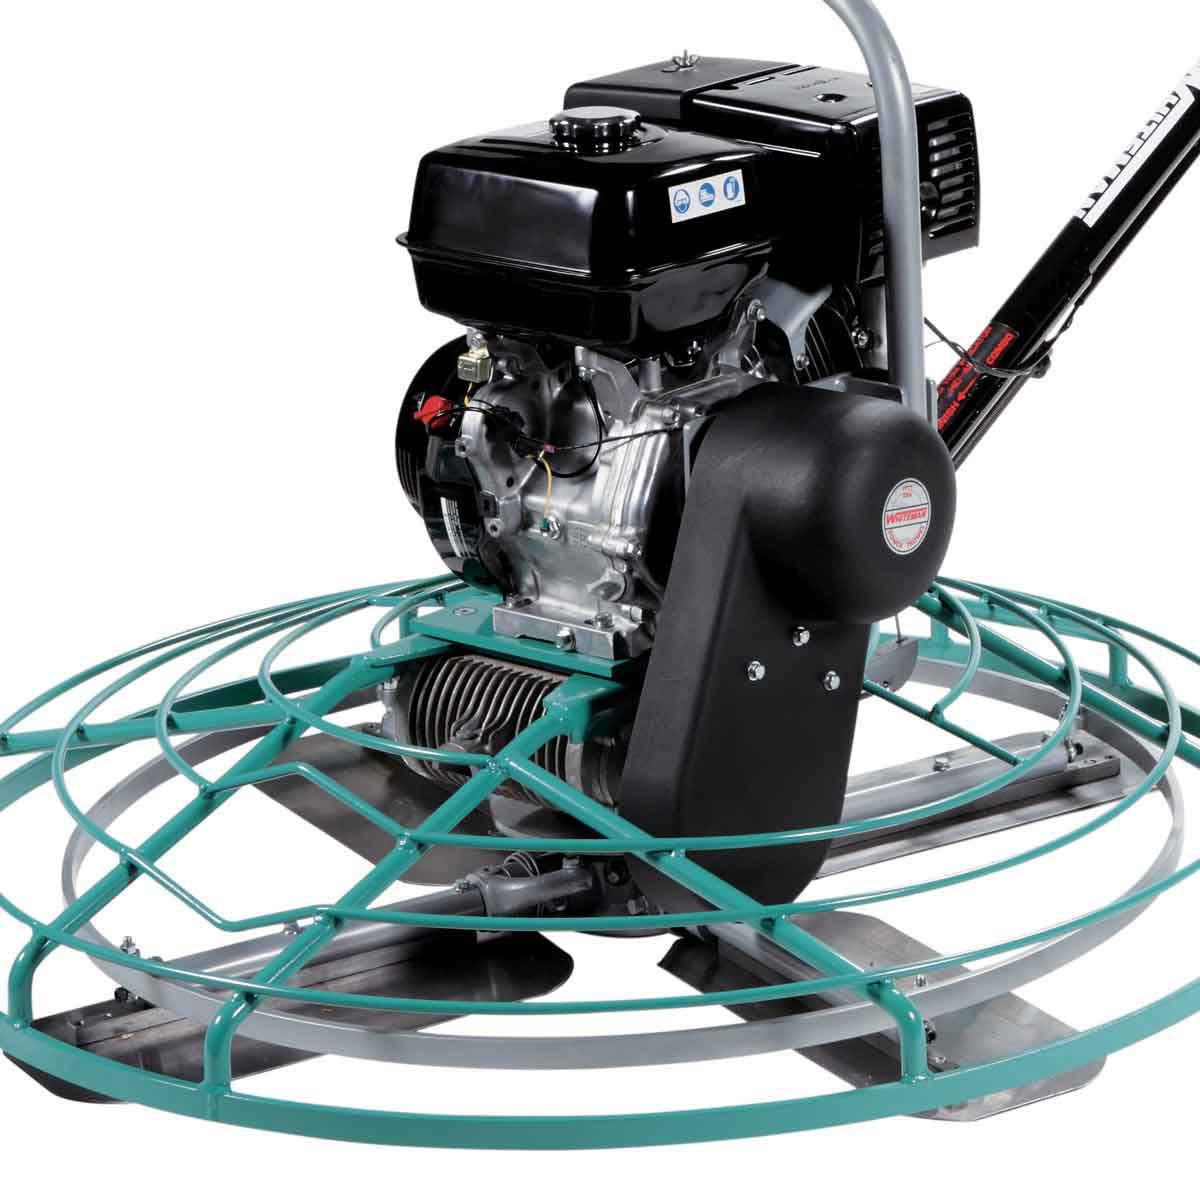 48 inch Power Trowel HDA48413H Multiquip